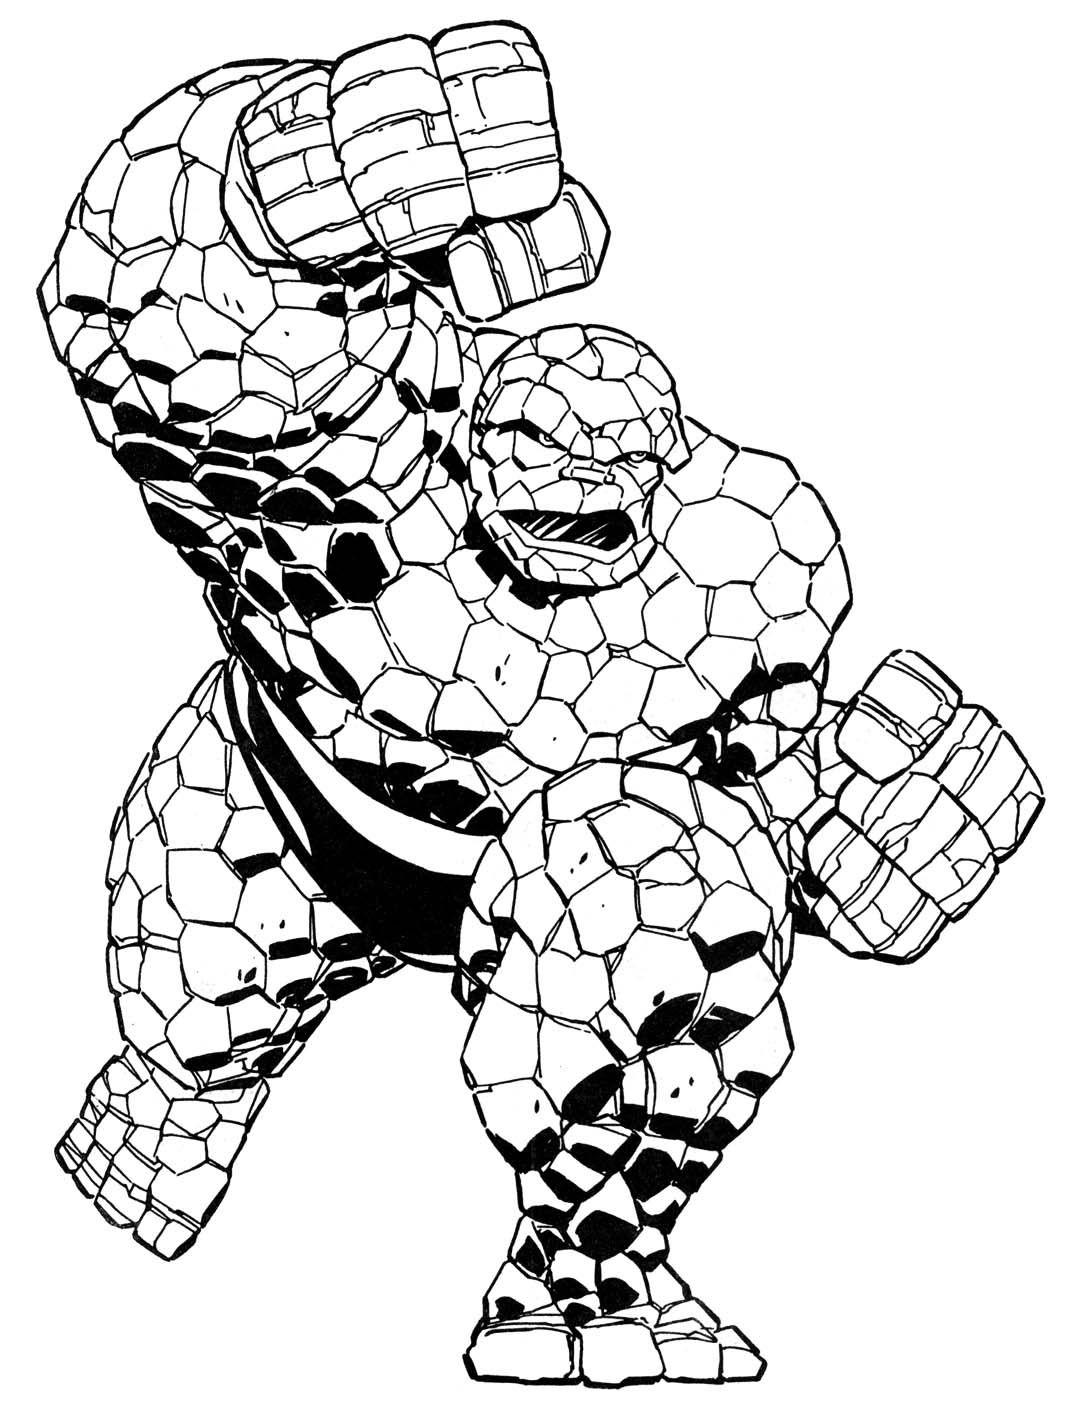 Coloring Book Marvel Super Heroes,Marvel Coloring Pages destiné Coloriage Marvel